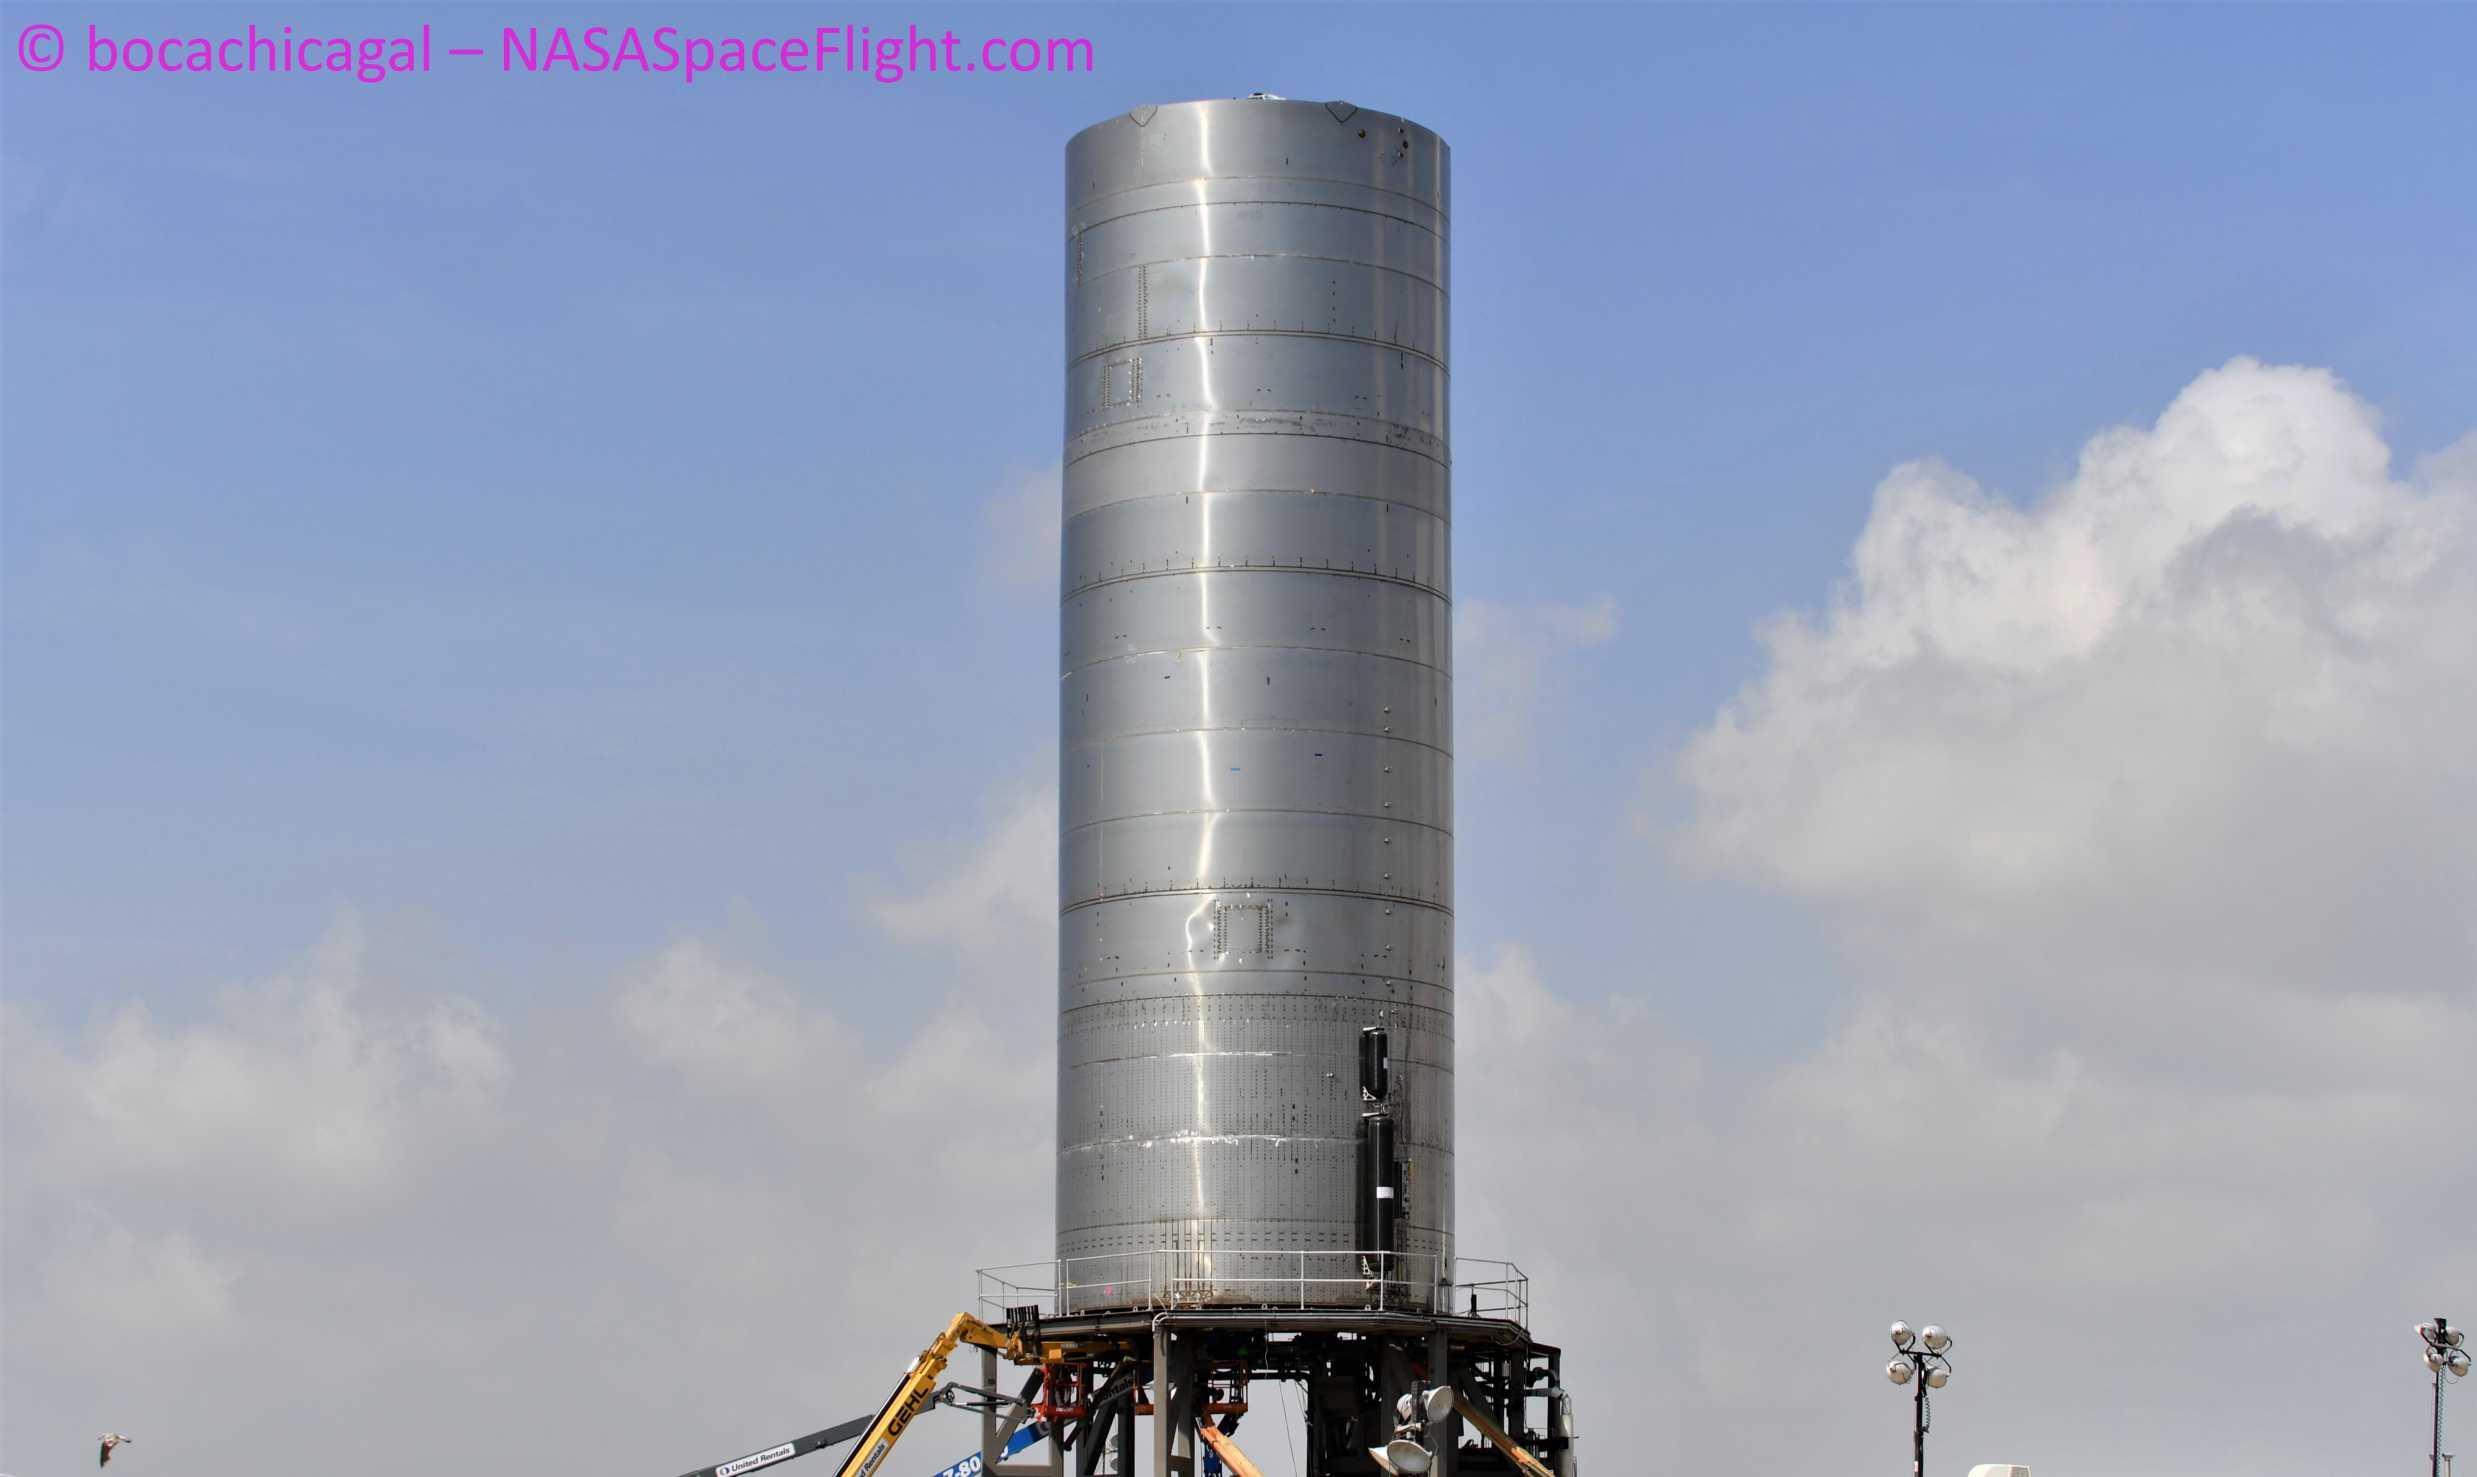 Starship Boca Chica 070620 (NASASpaceflight – bocachicagal) SN5 pad work 5 crop (c)